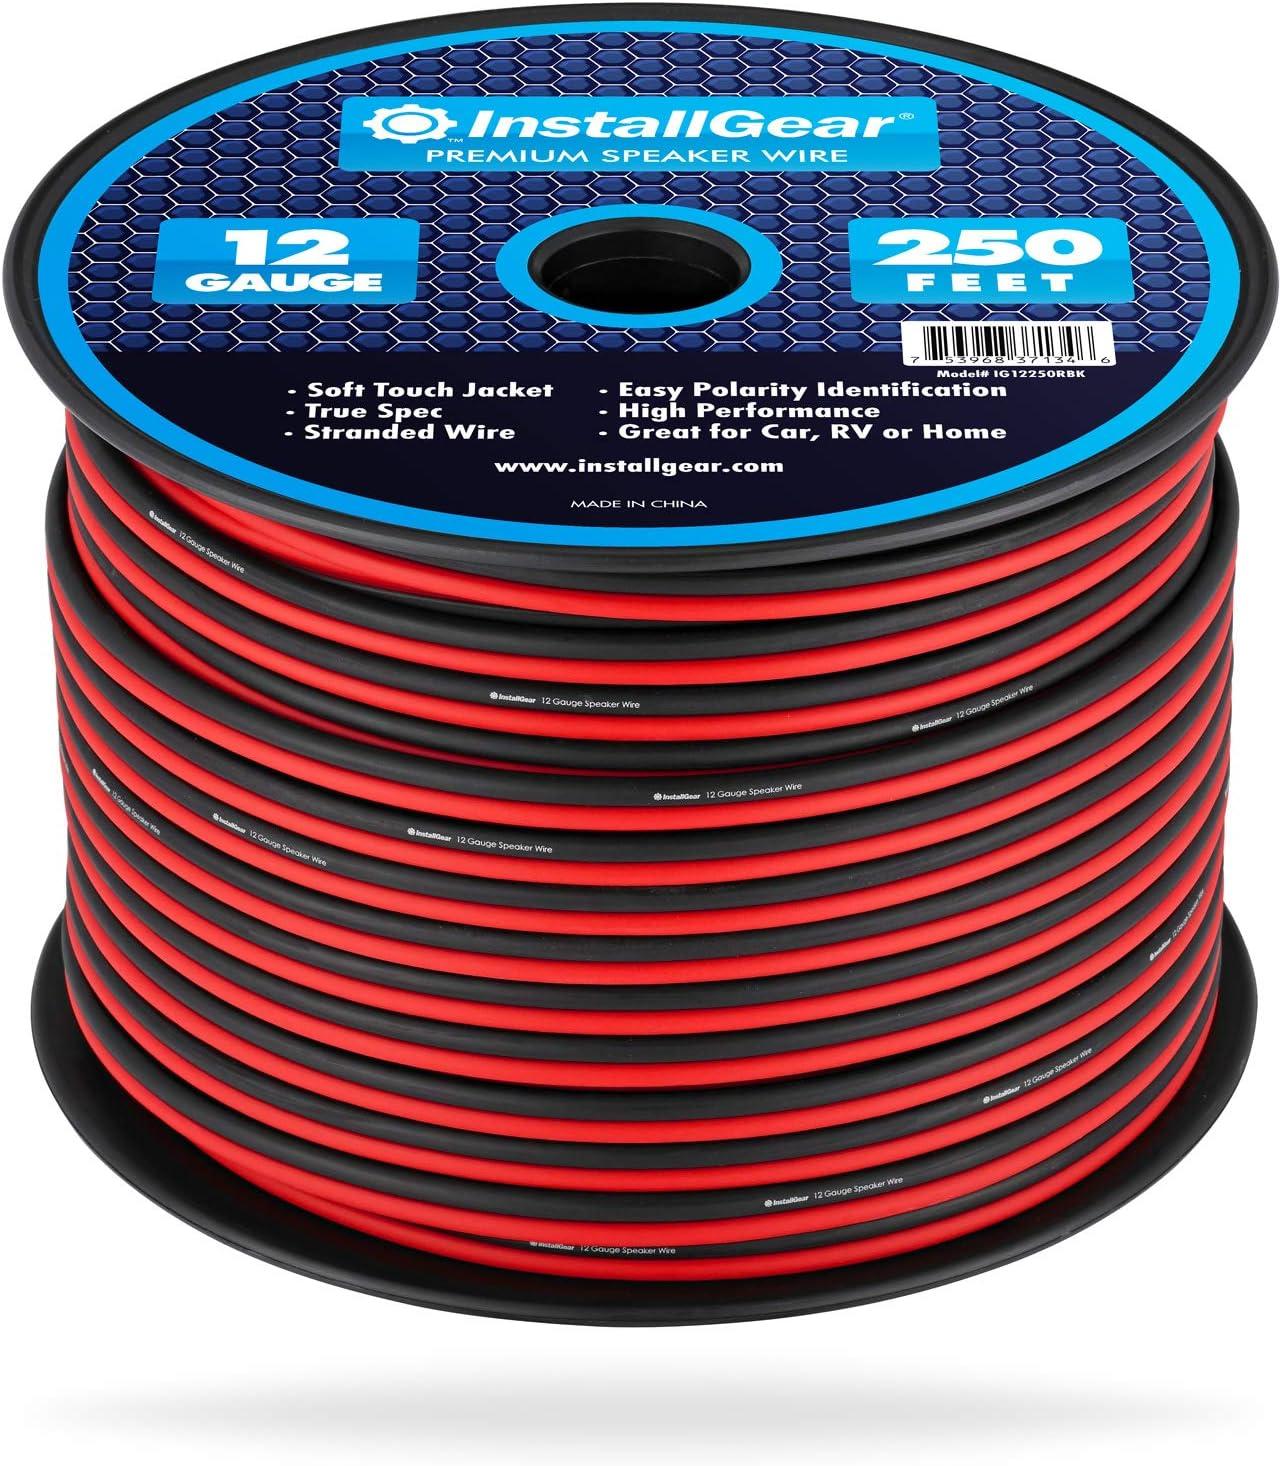 InstallGear 9 Gauge Speaker Wire (9-feet - Red/Black)